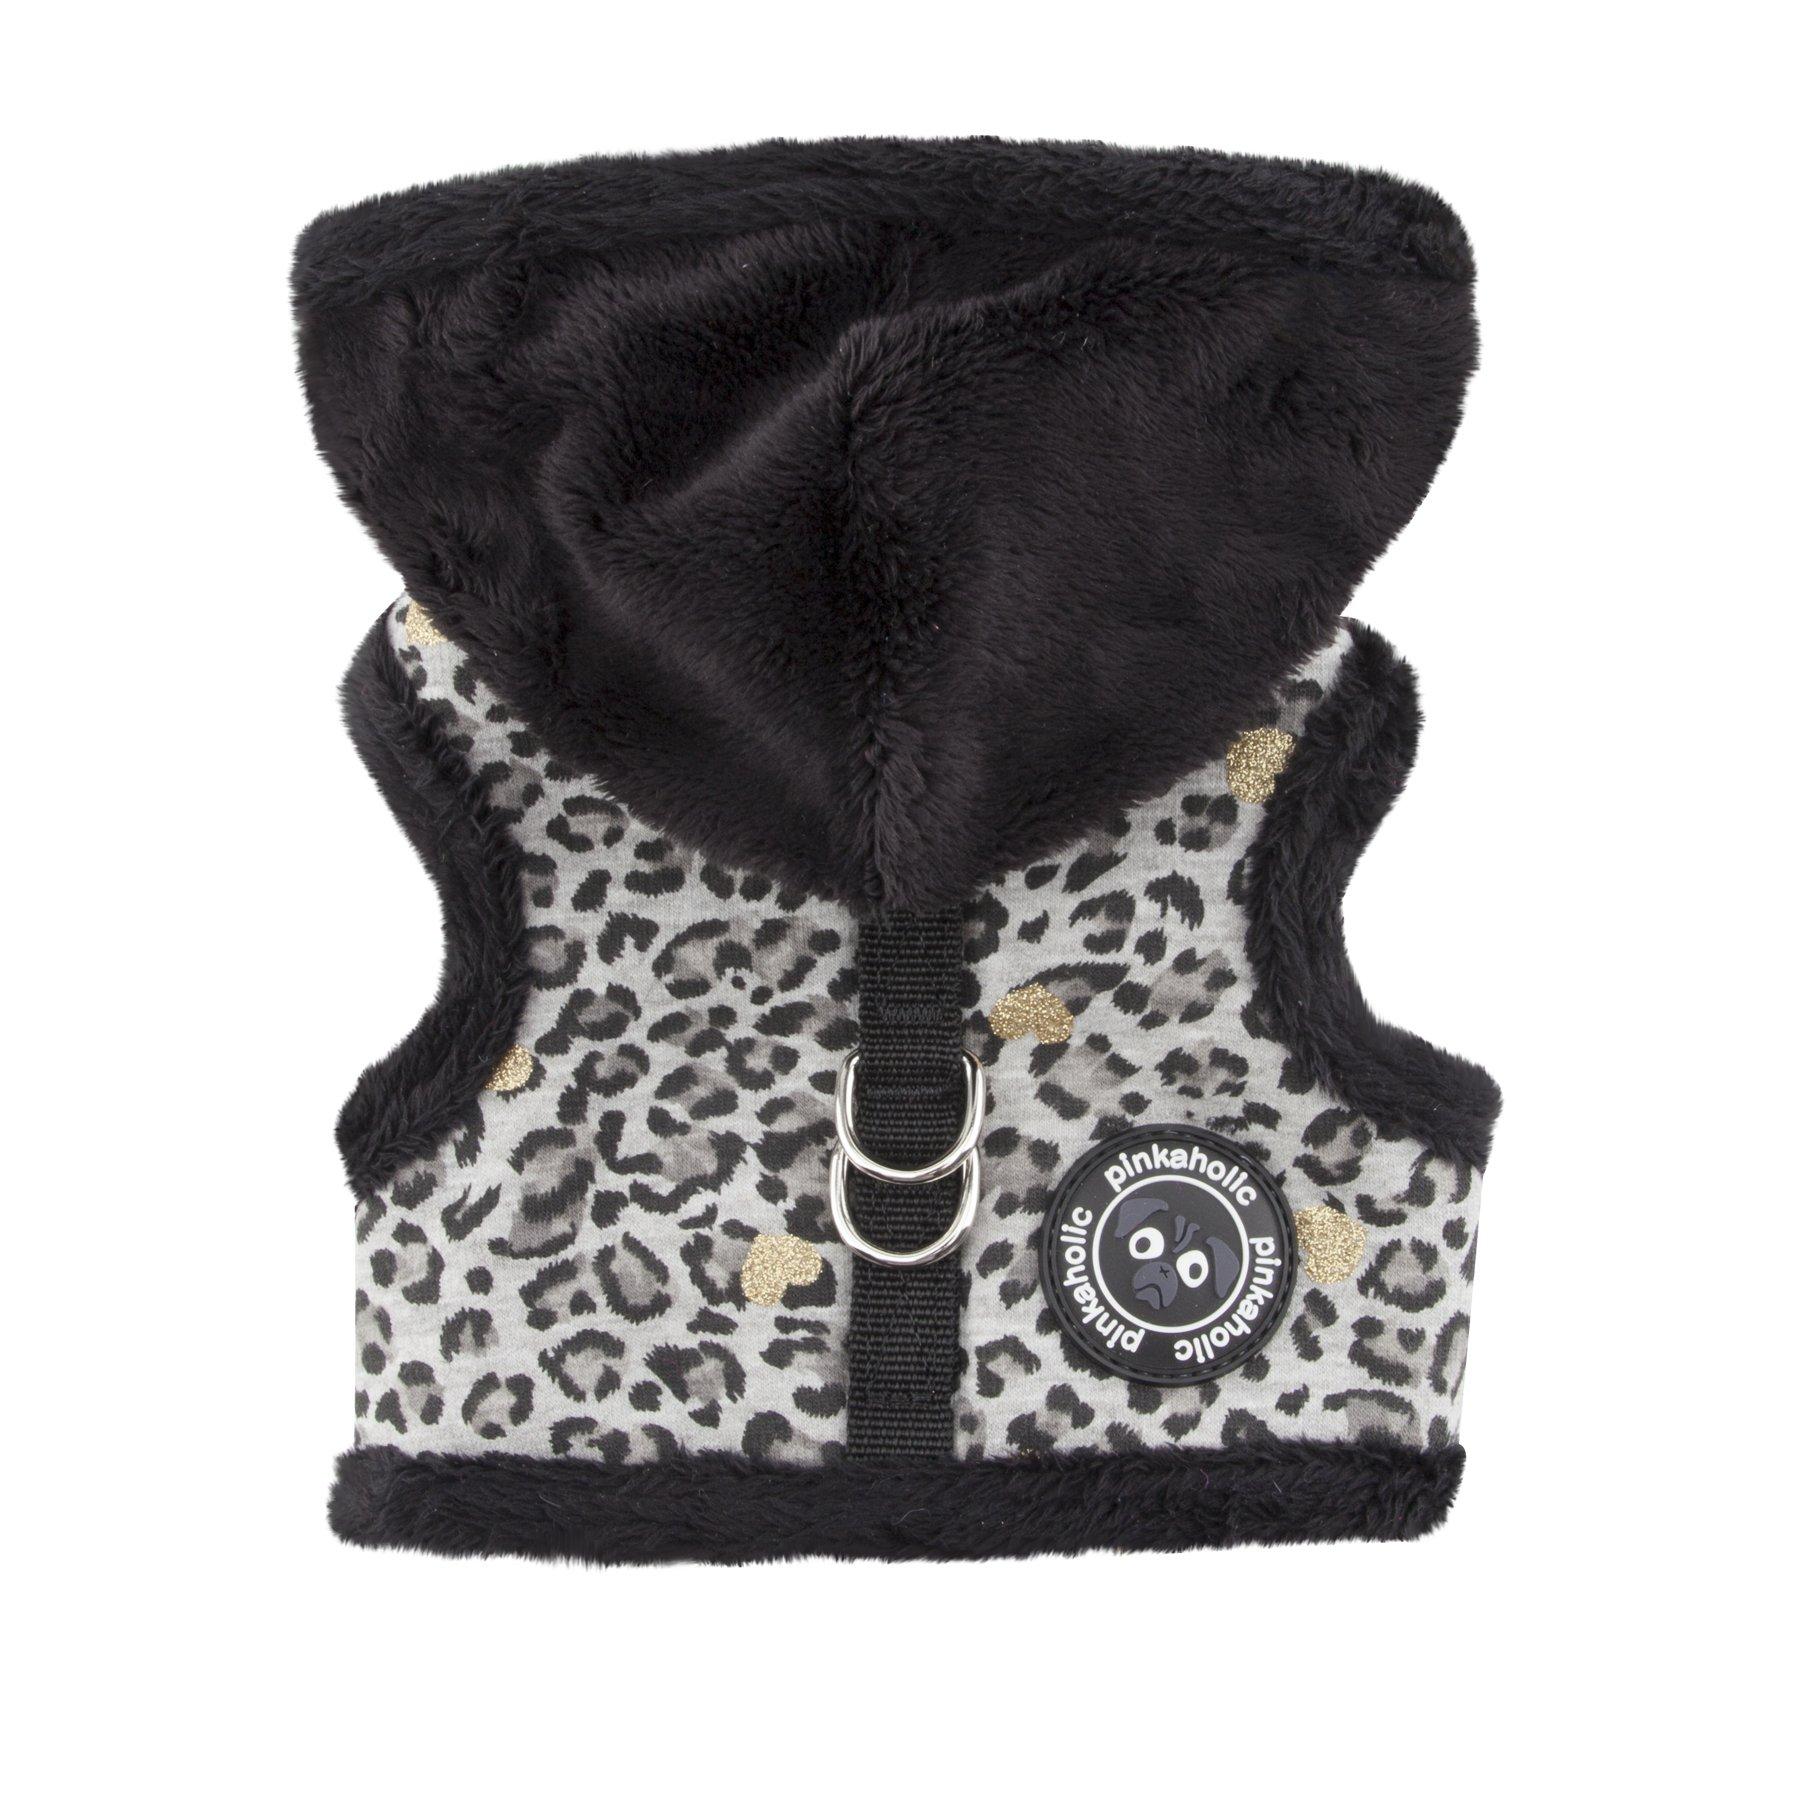 Pinkaholic New York Leo Pug Pinka Harness for Pets, Black, Large by Pinkaholic New York